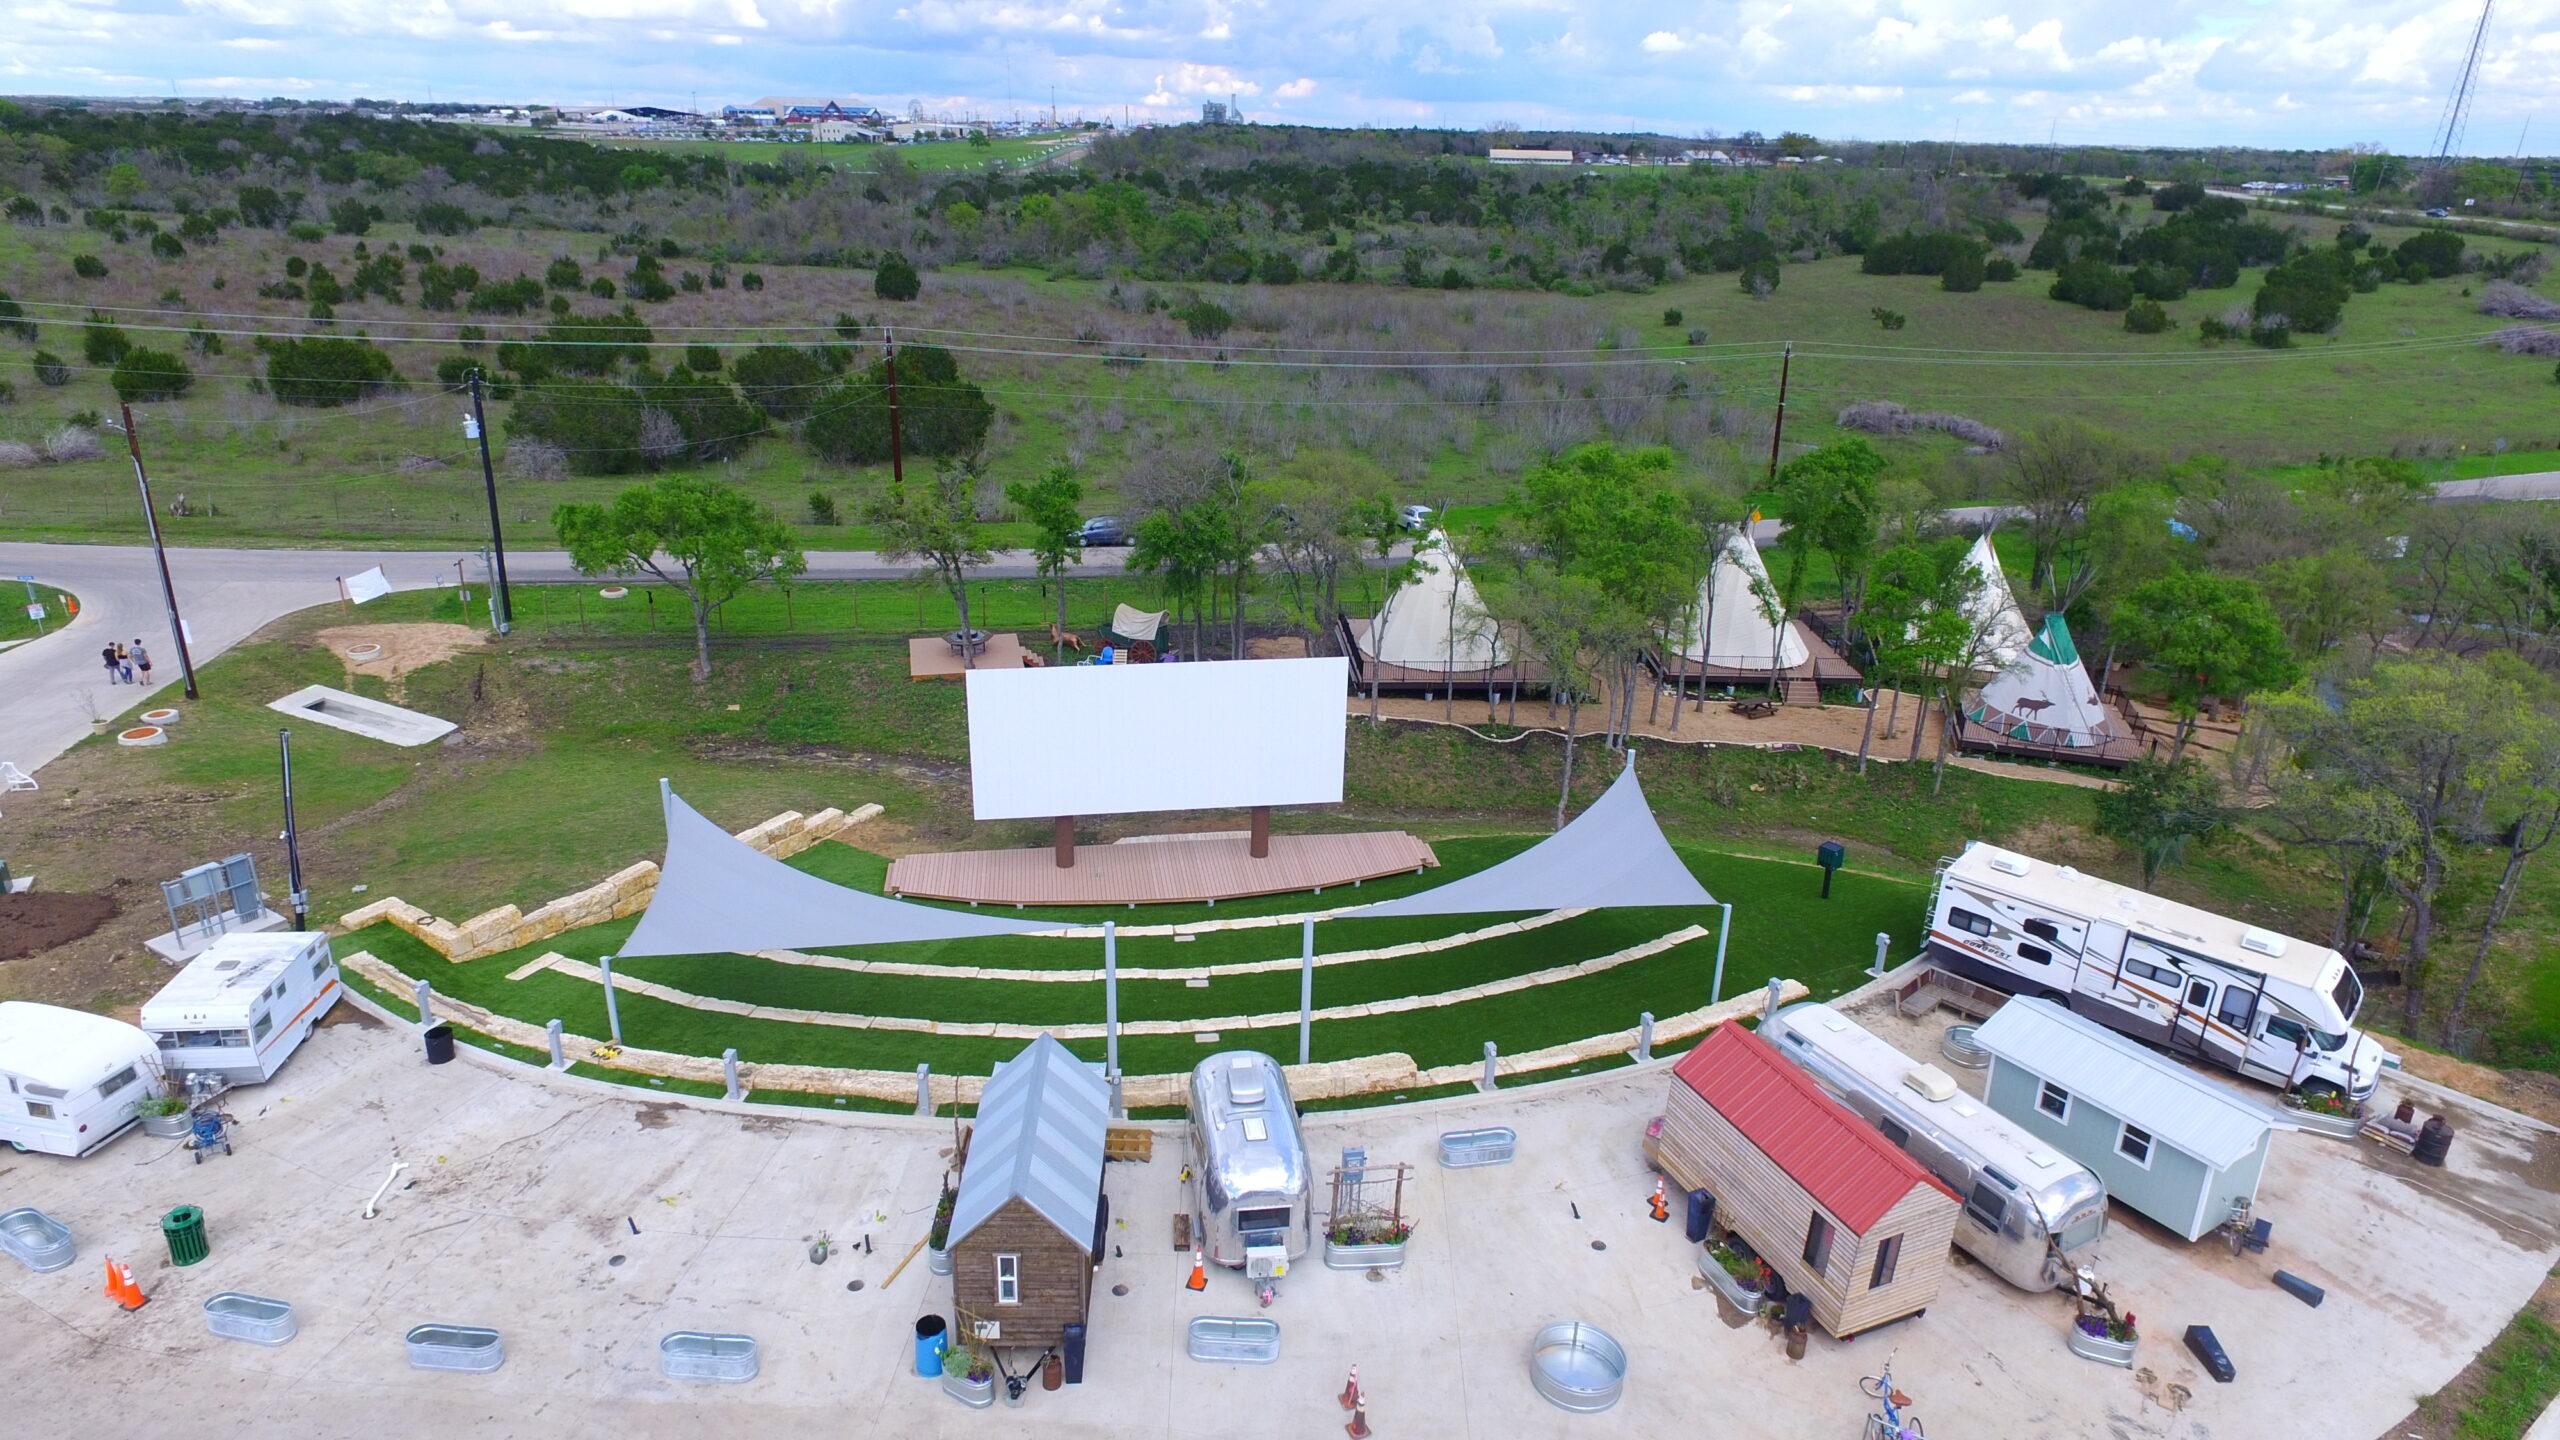 Alamo Drafthouse Amphitheater at Community First Village